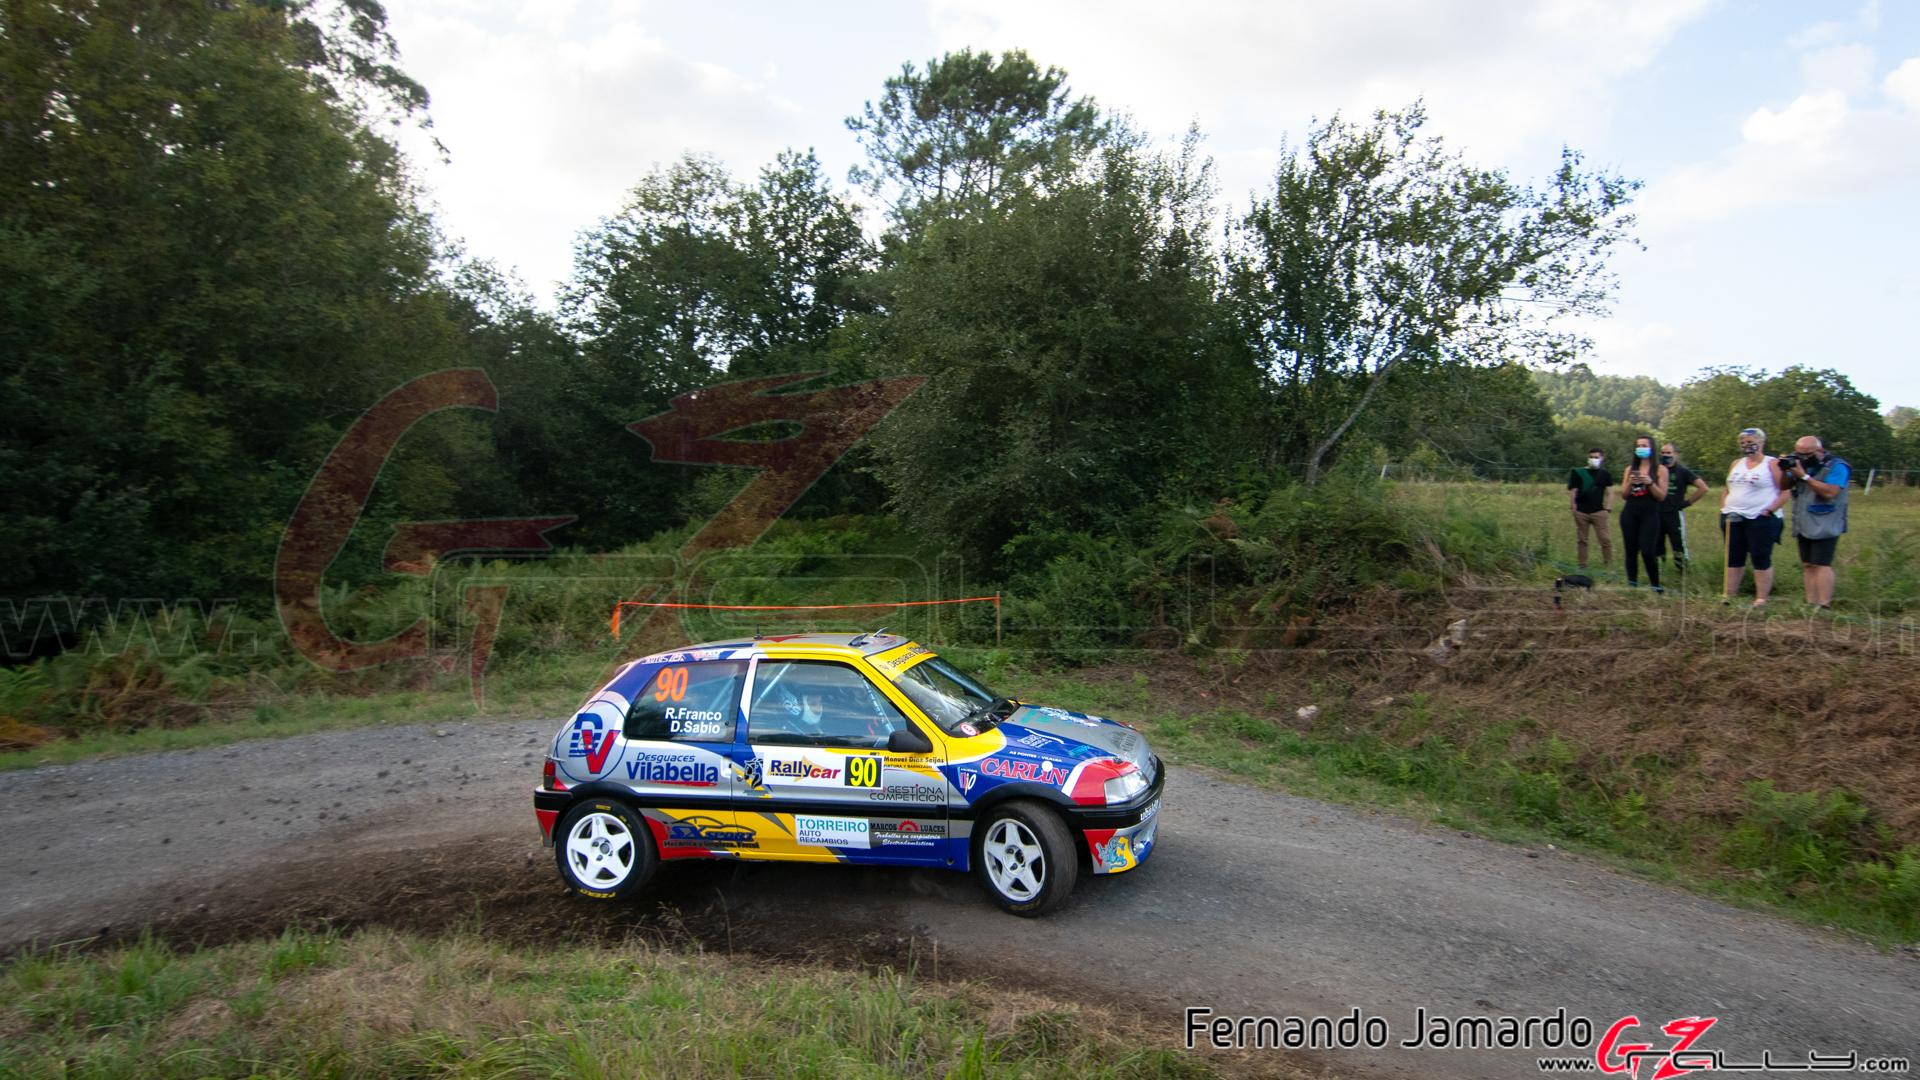 Rally de Ferrol 2020 - Fernando Jamardo